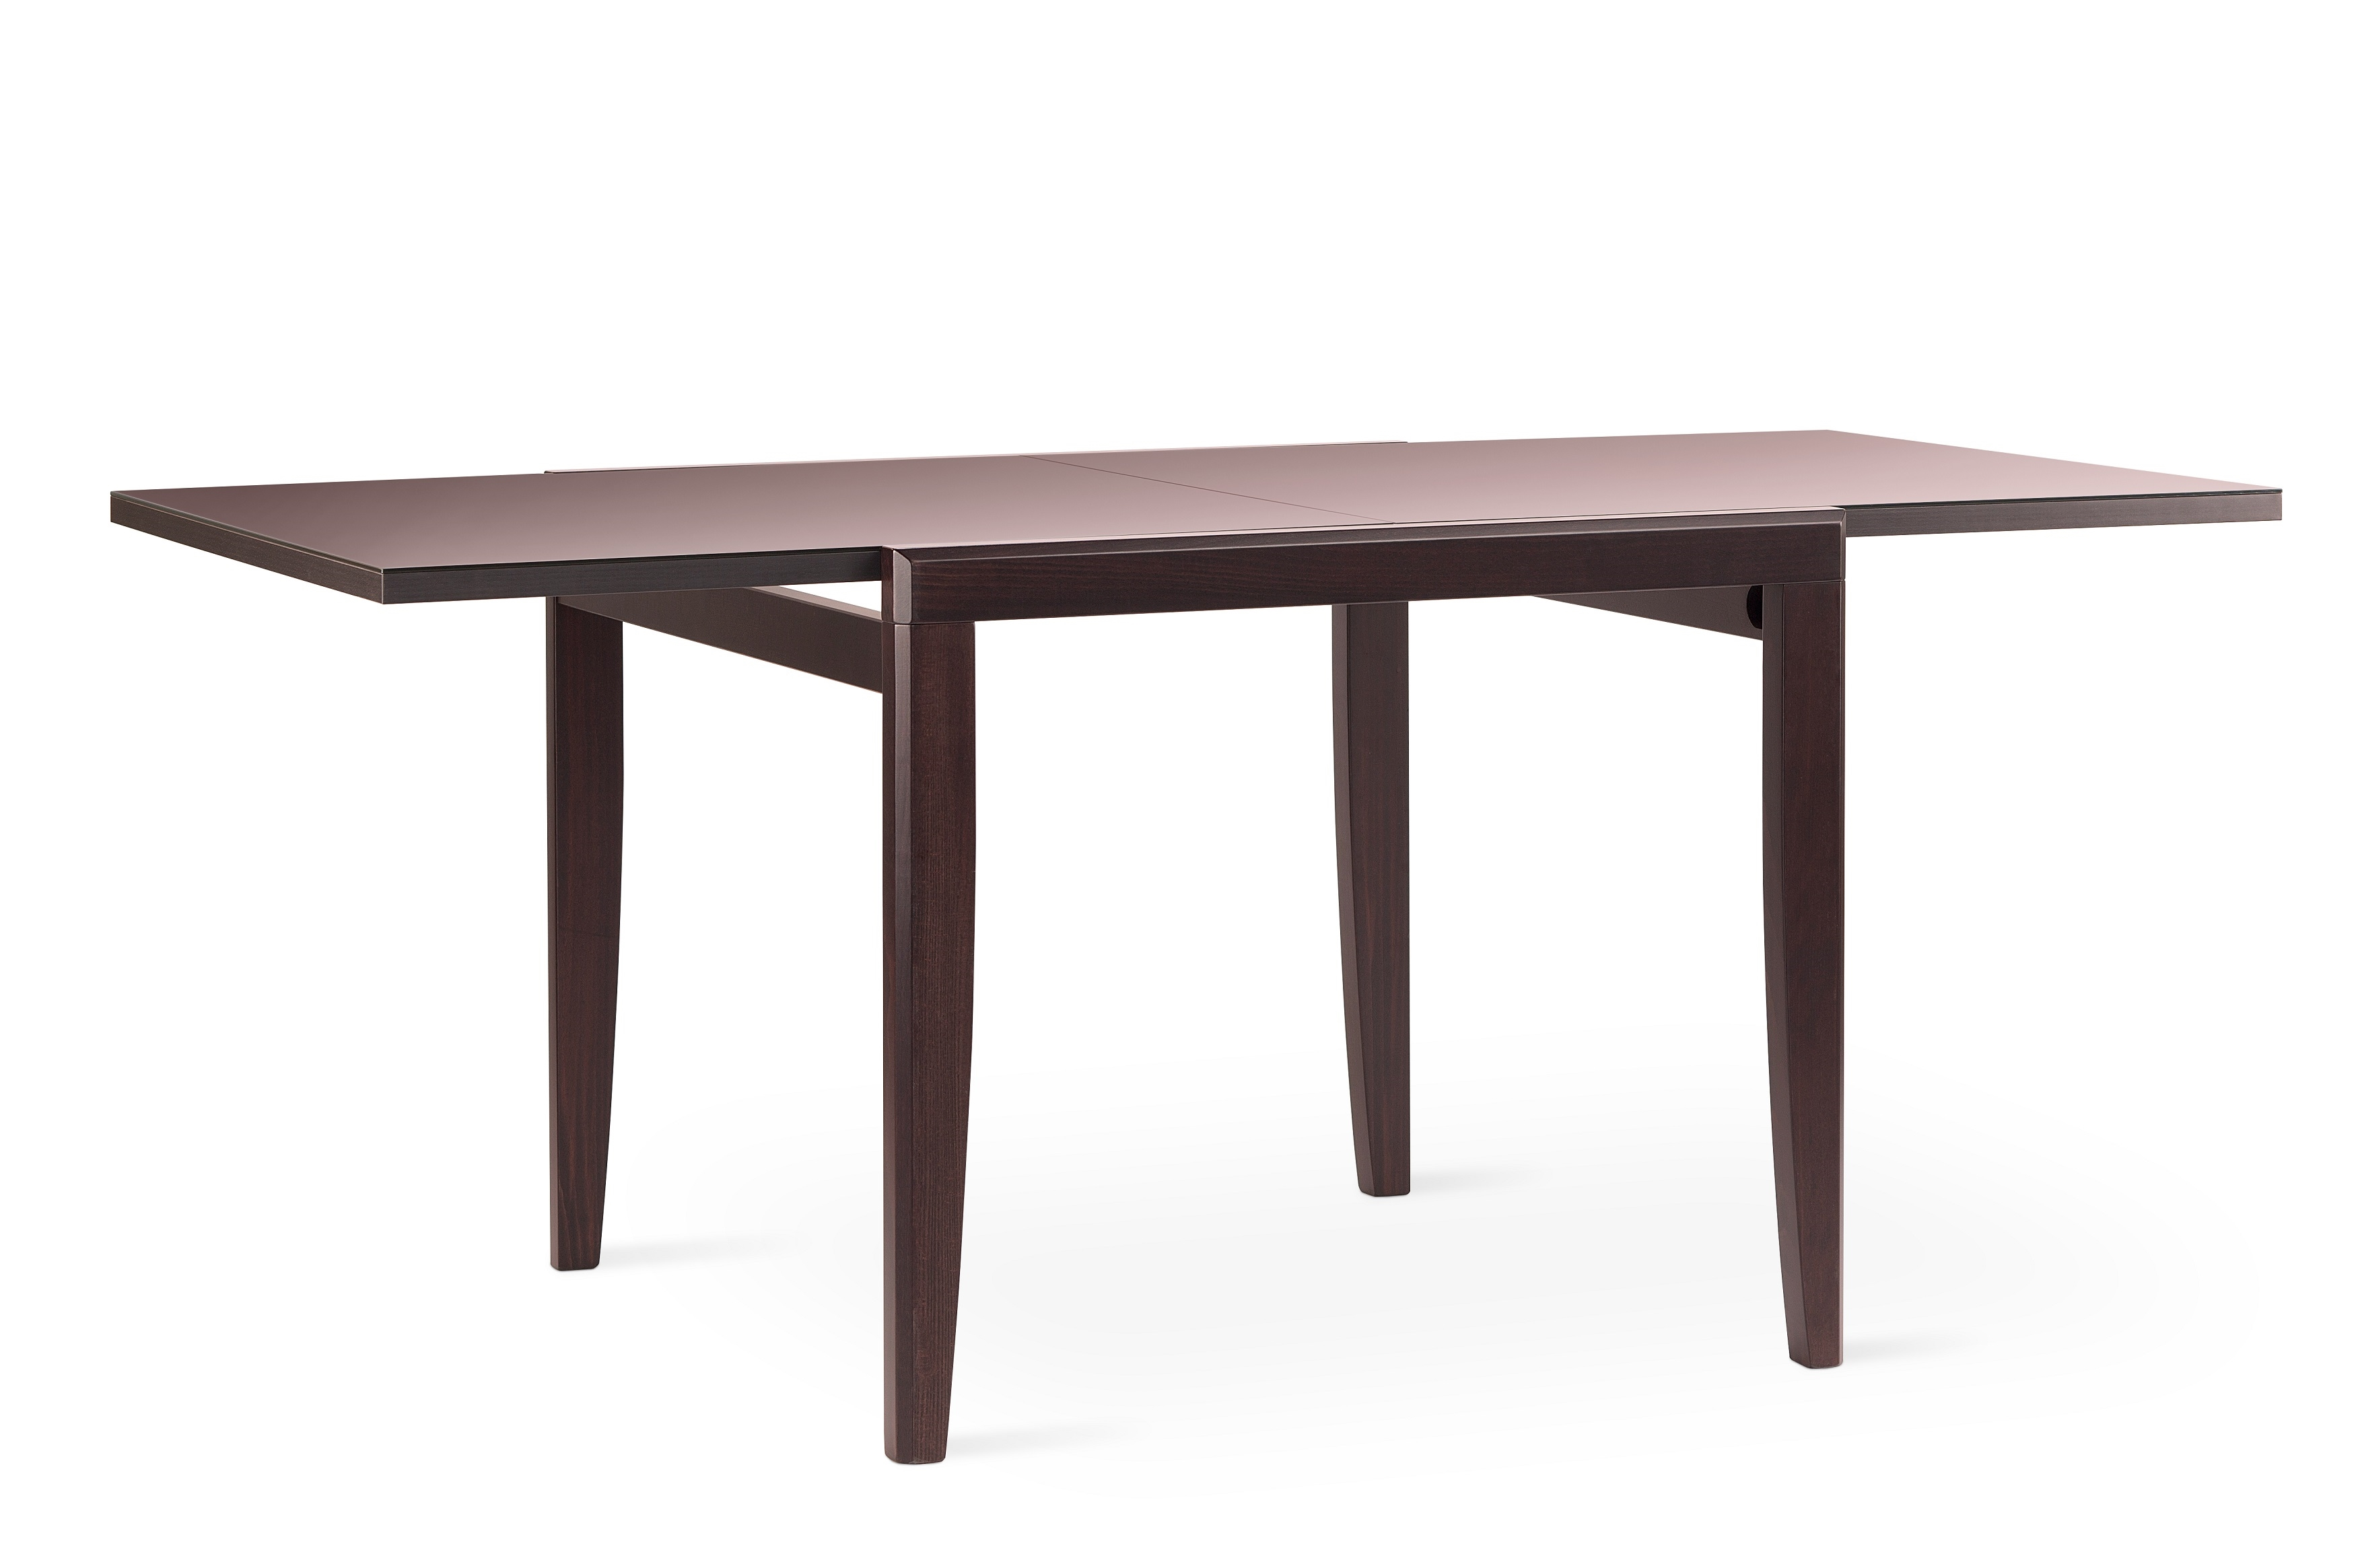 Tavoli tondi allungabili moderni sei in home ue tavoli ue for Tavoli allungabili moderni calligaris